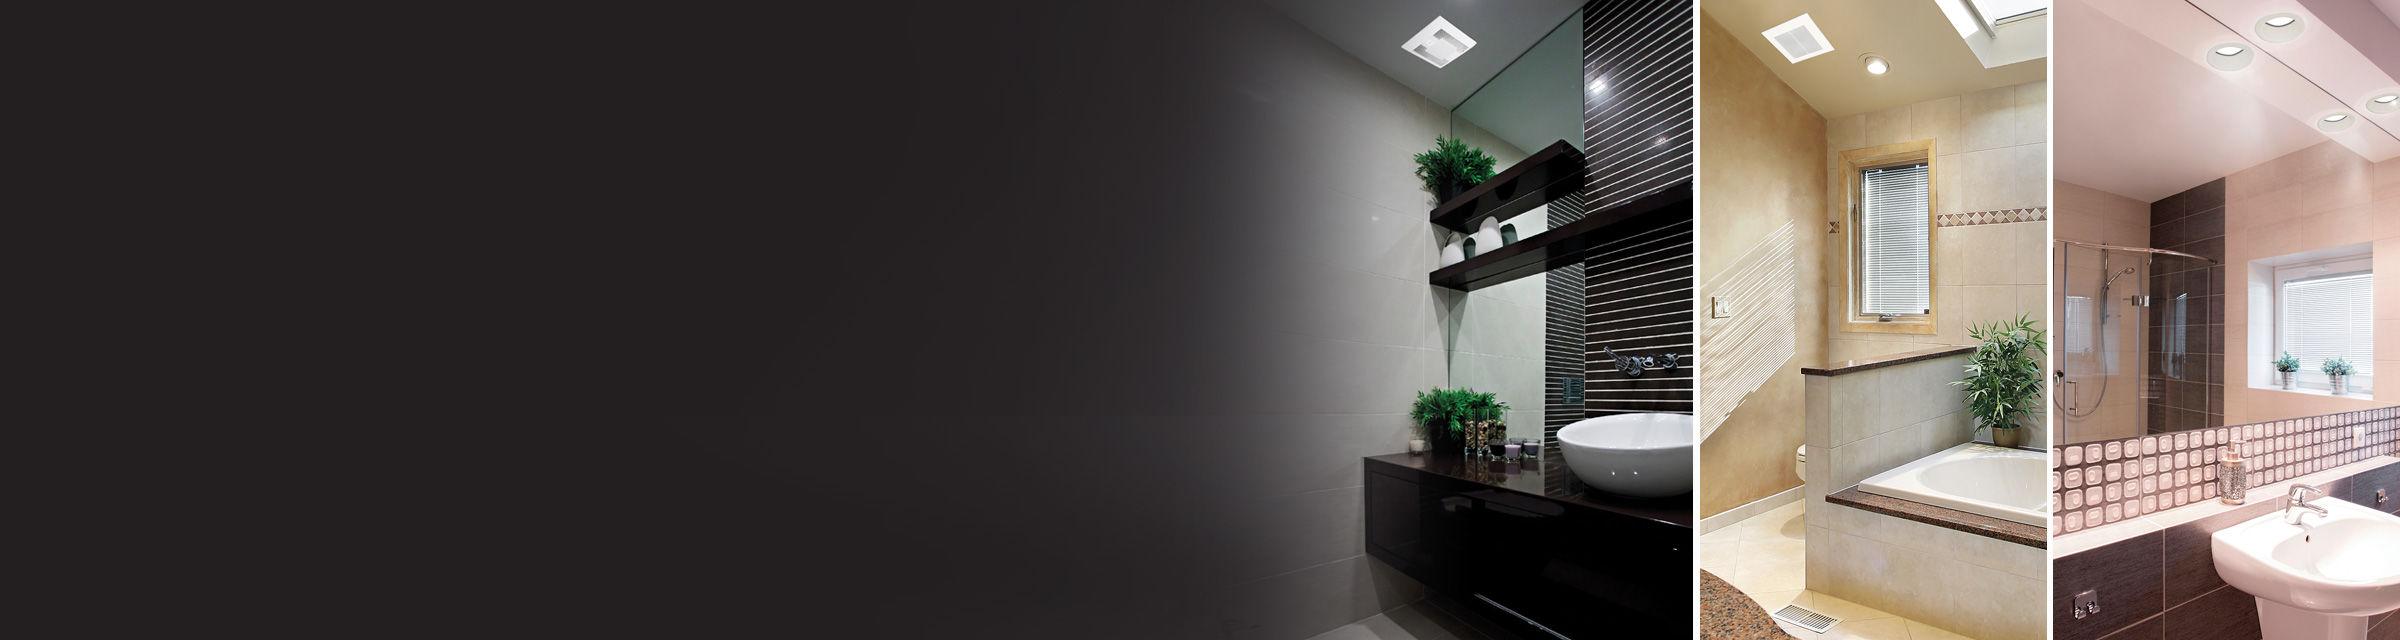 Ventilation Fans Panasonic North America United States Bathroom Ceiling Extractor Fan Pull Cord Switch Moneysavingexpert